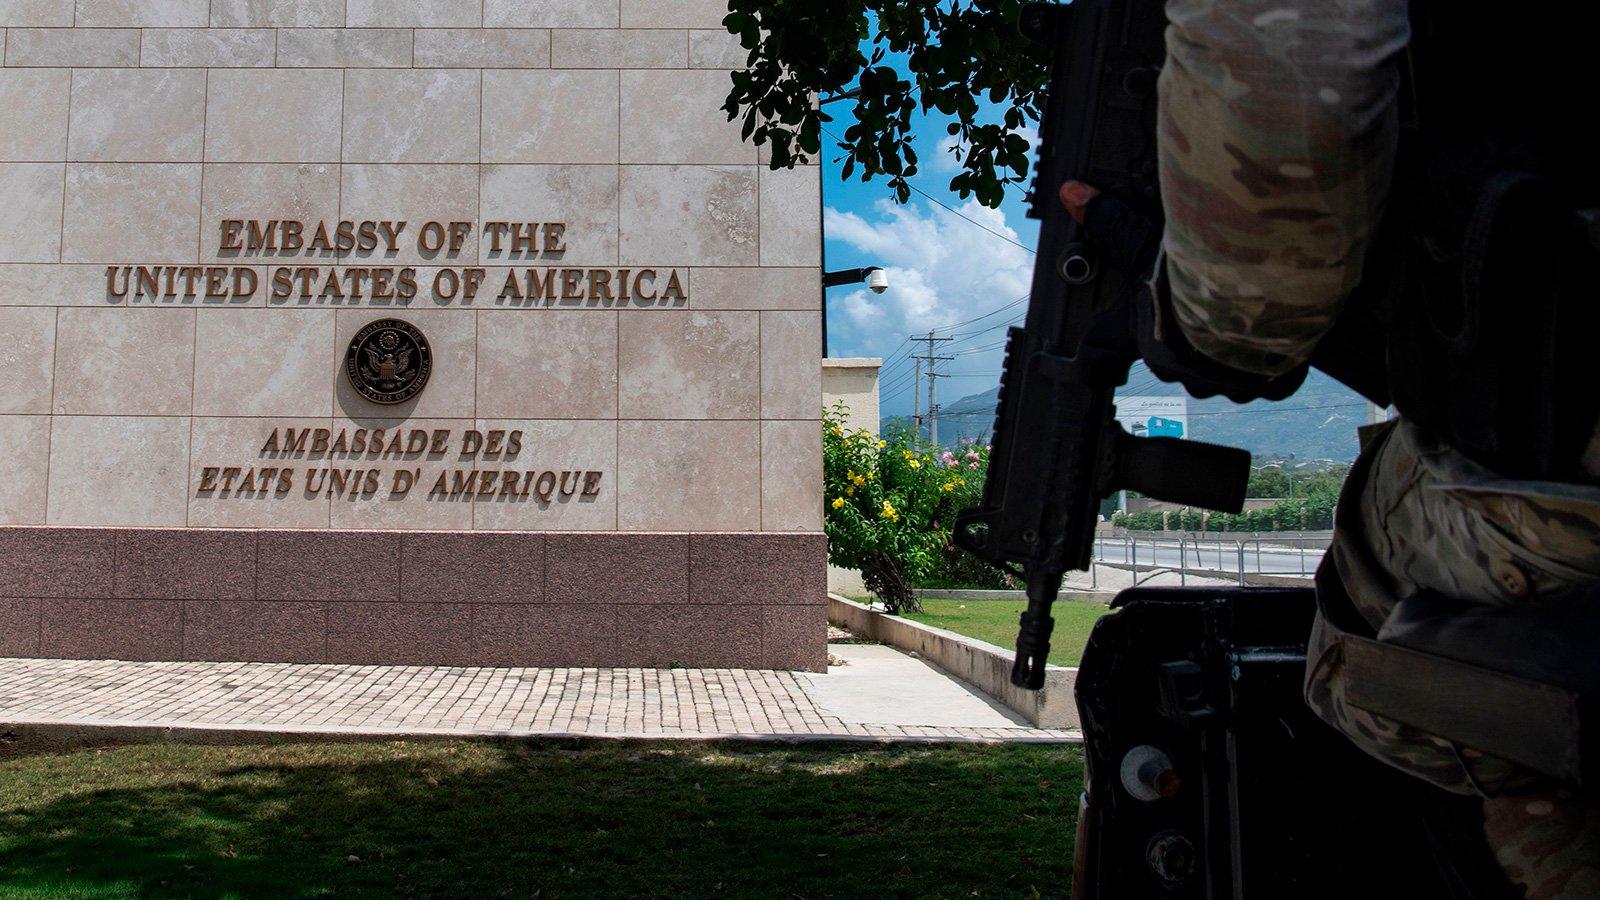 圖為美國駐海地大使館。(攝於2019年4月29日)(CHANDAN KHANNA/AFP via Getty Images)